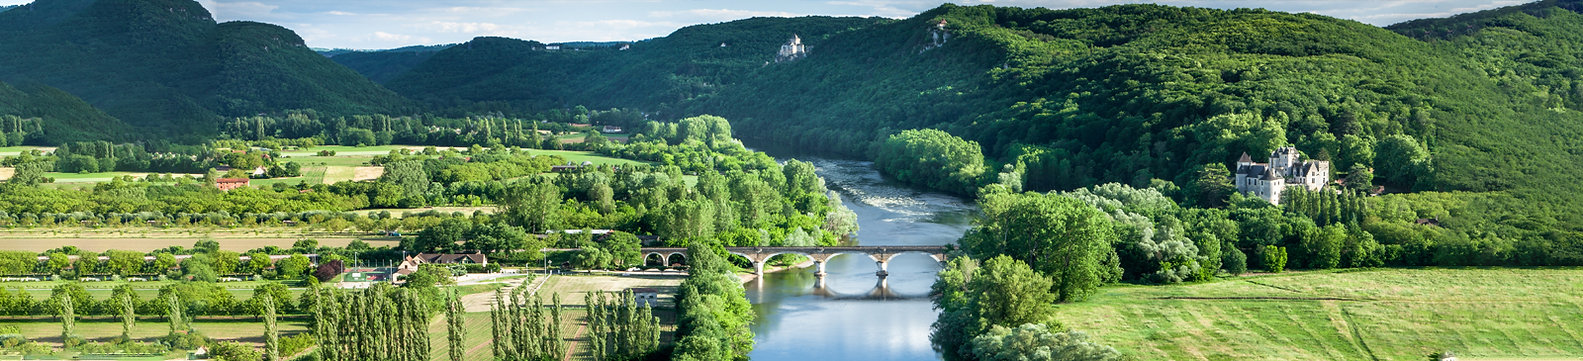 Dordogne Web header image2.jpg